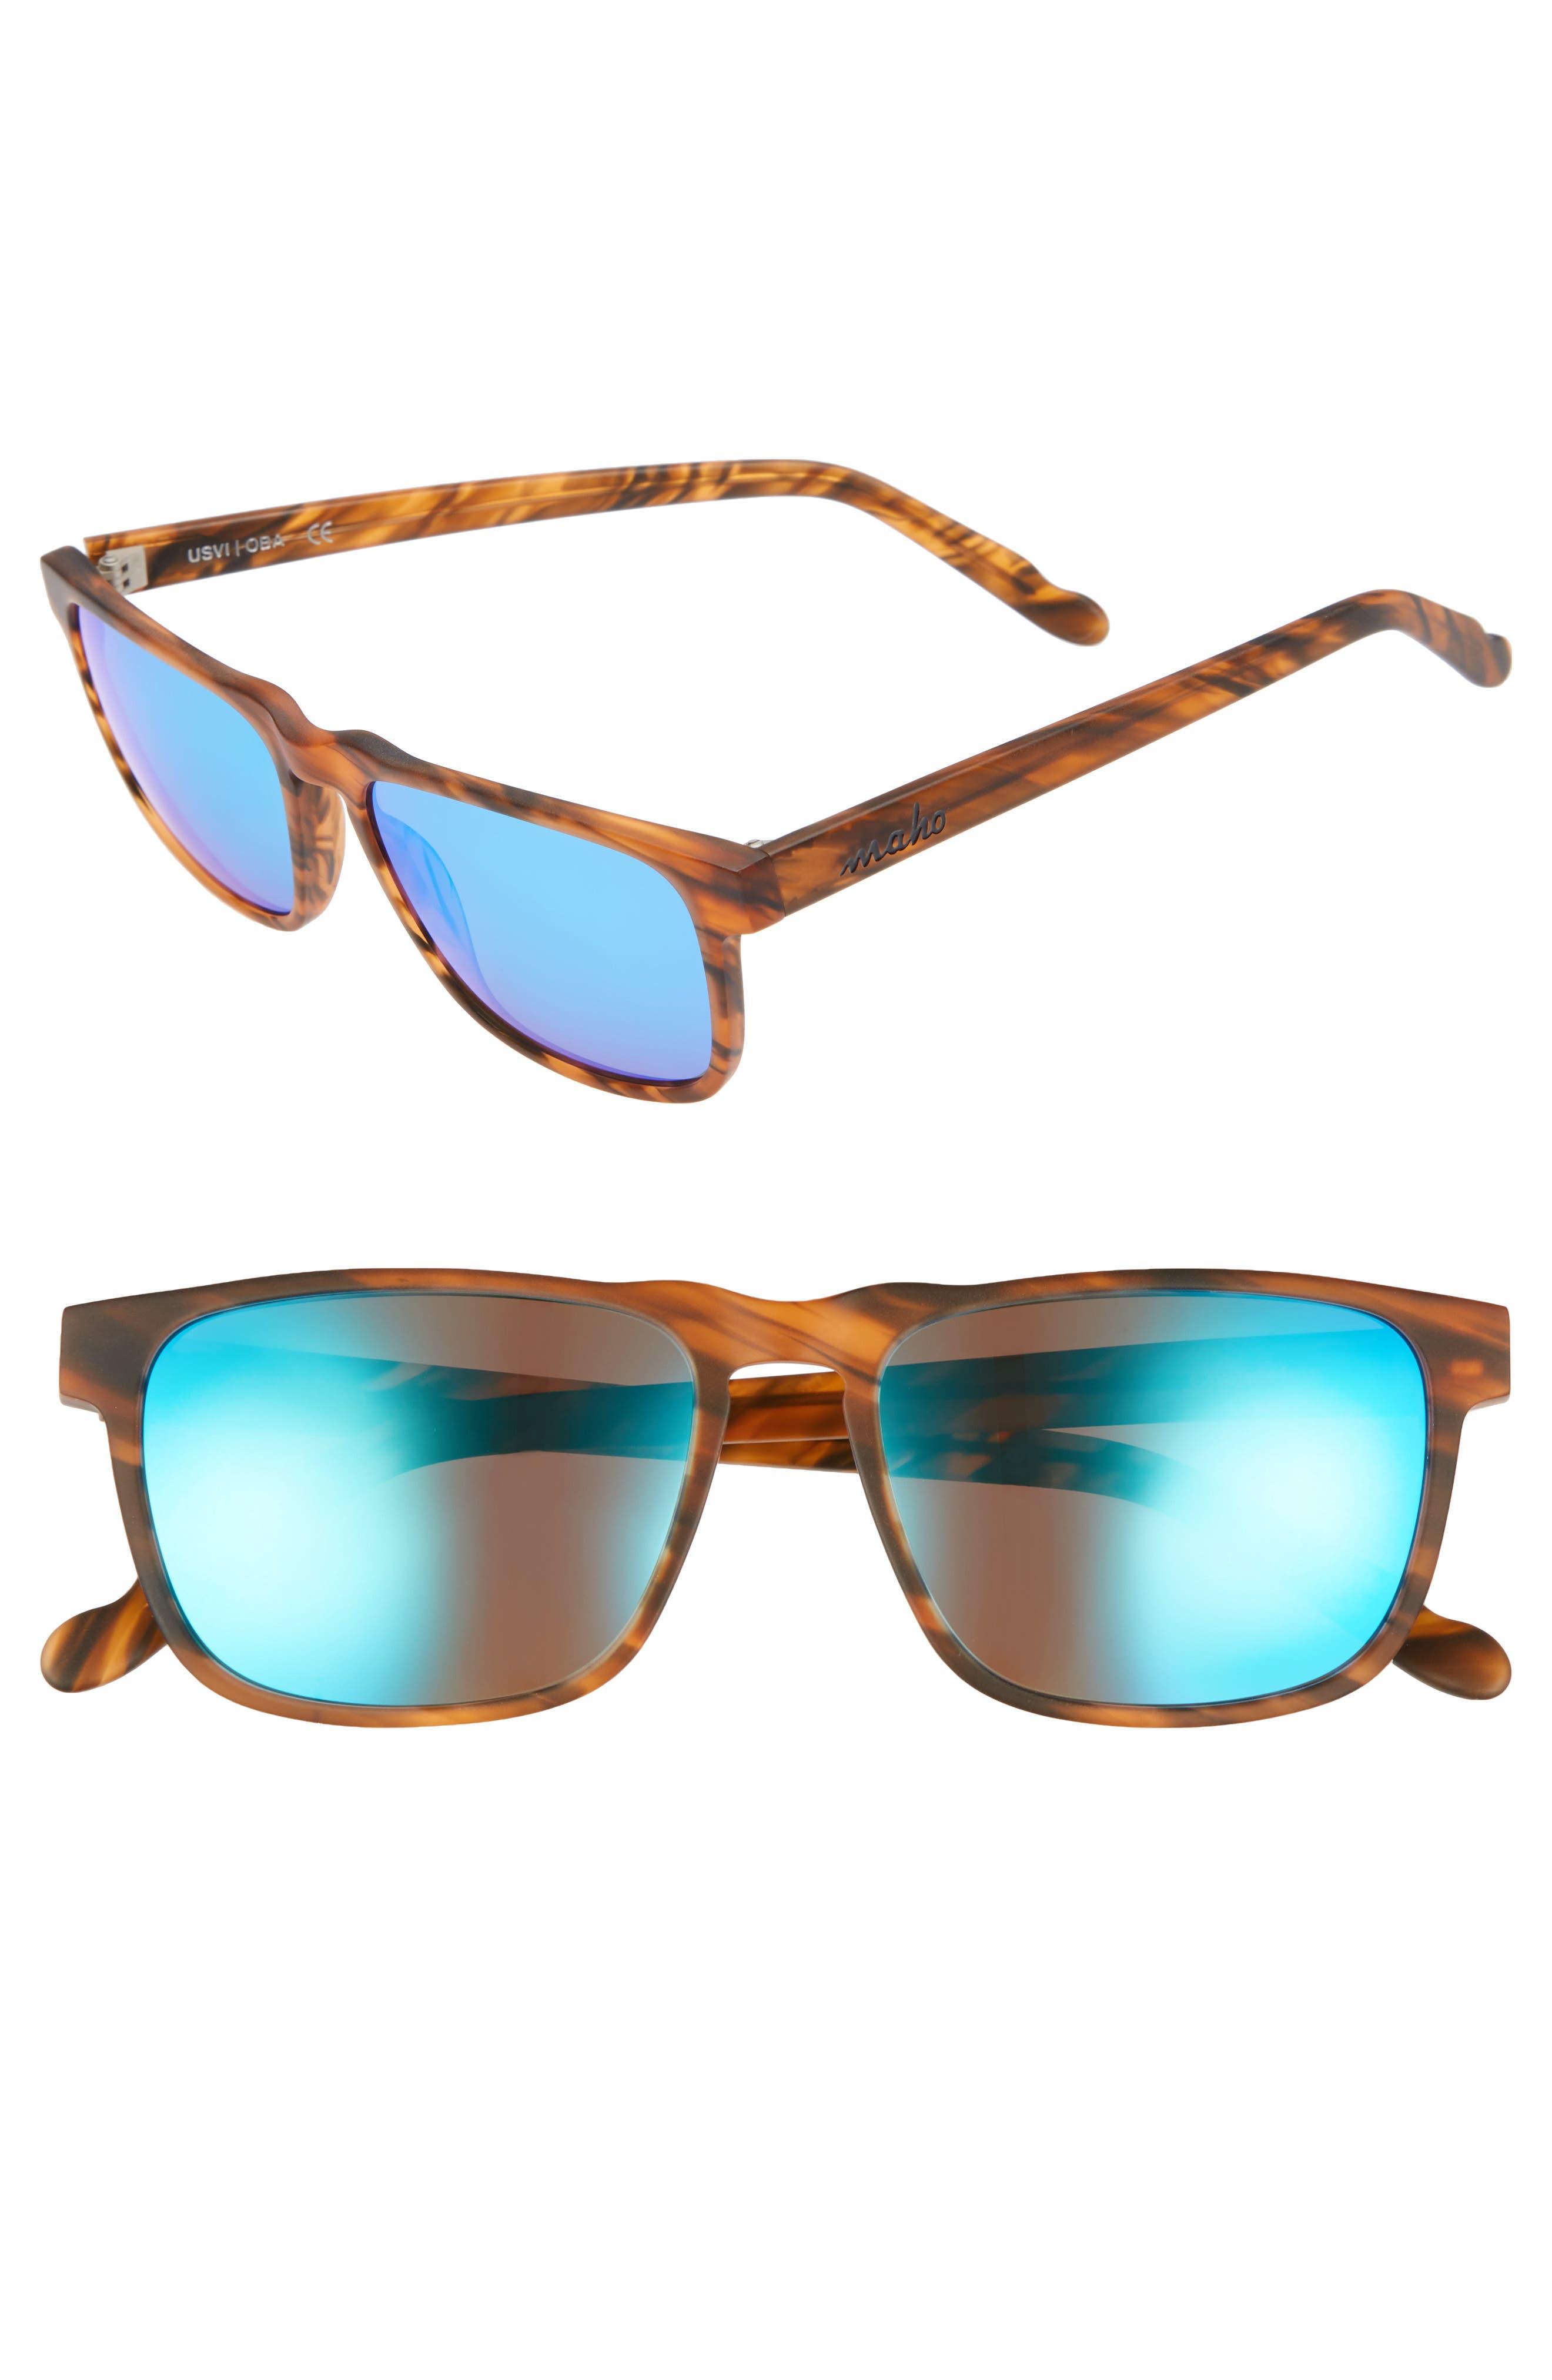 Alternate Image 1 Selected - Maho Chandeleur 59mm Polarized Aviator Sunglasses